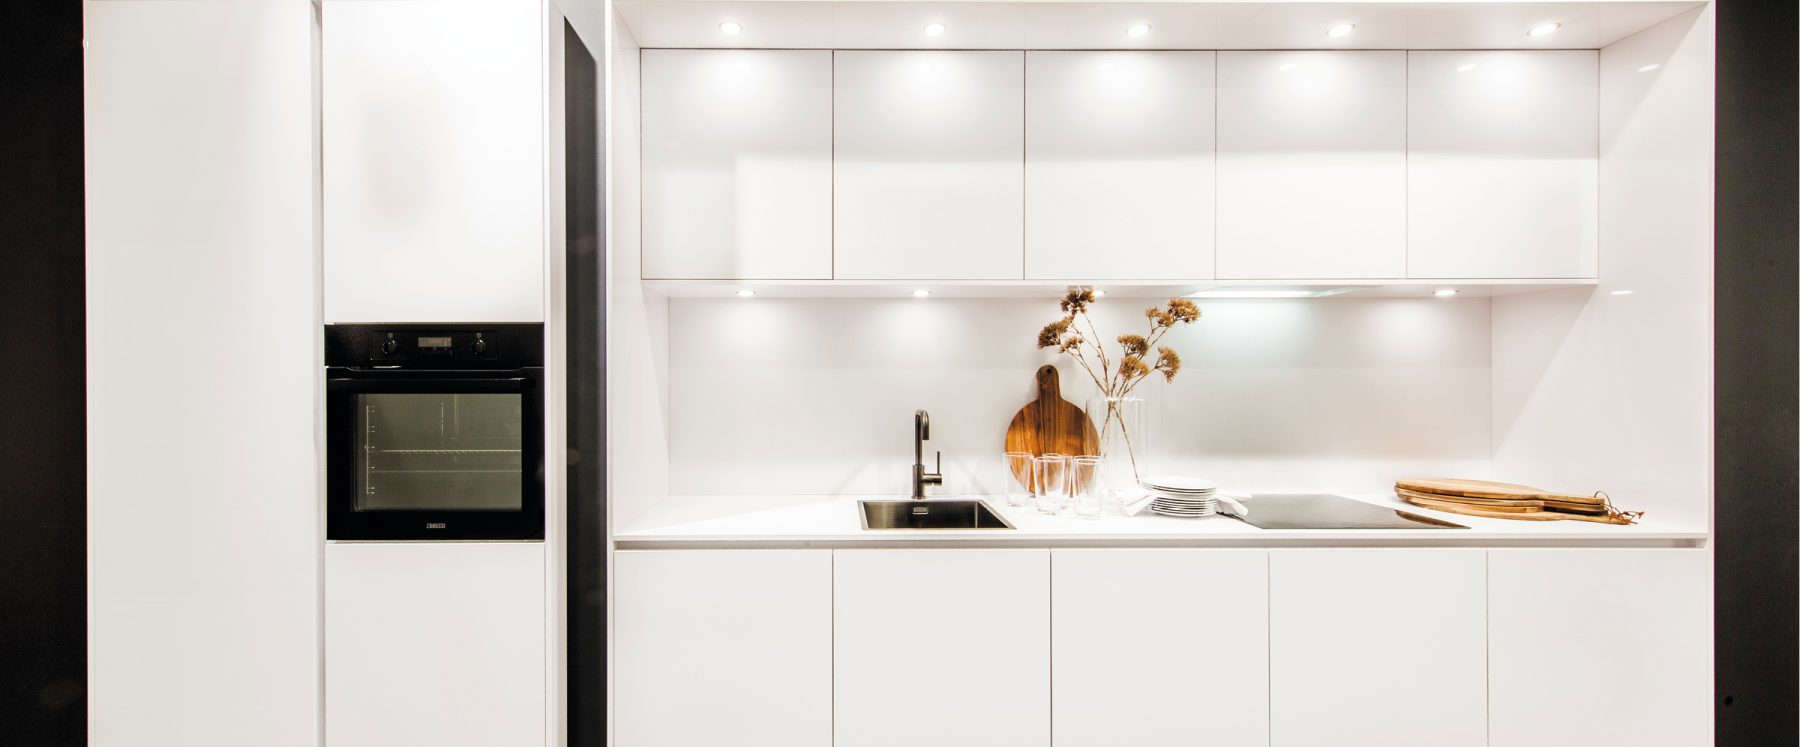 Moderne, witte wandkeuken